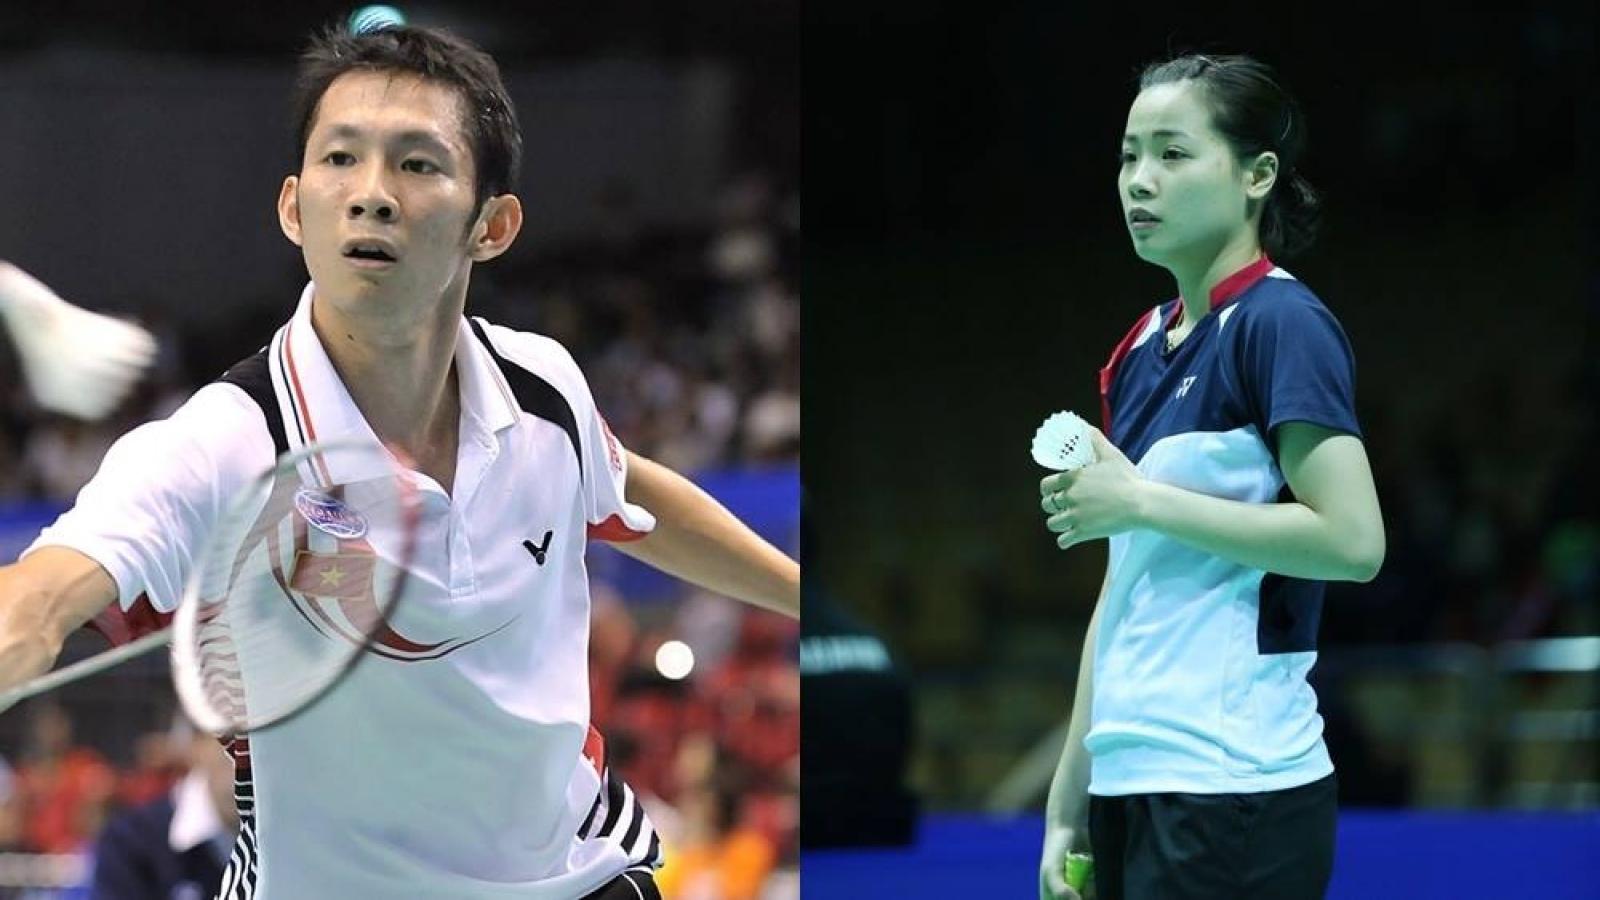 Local badminton players win spots at 2020 Tokyo Olympics